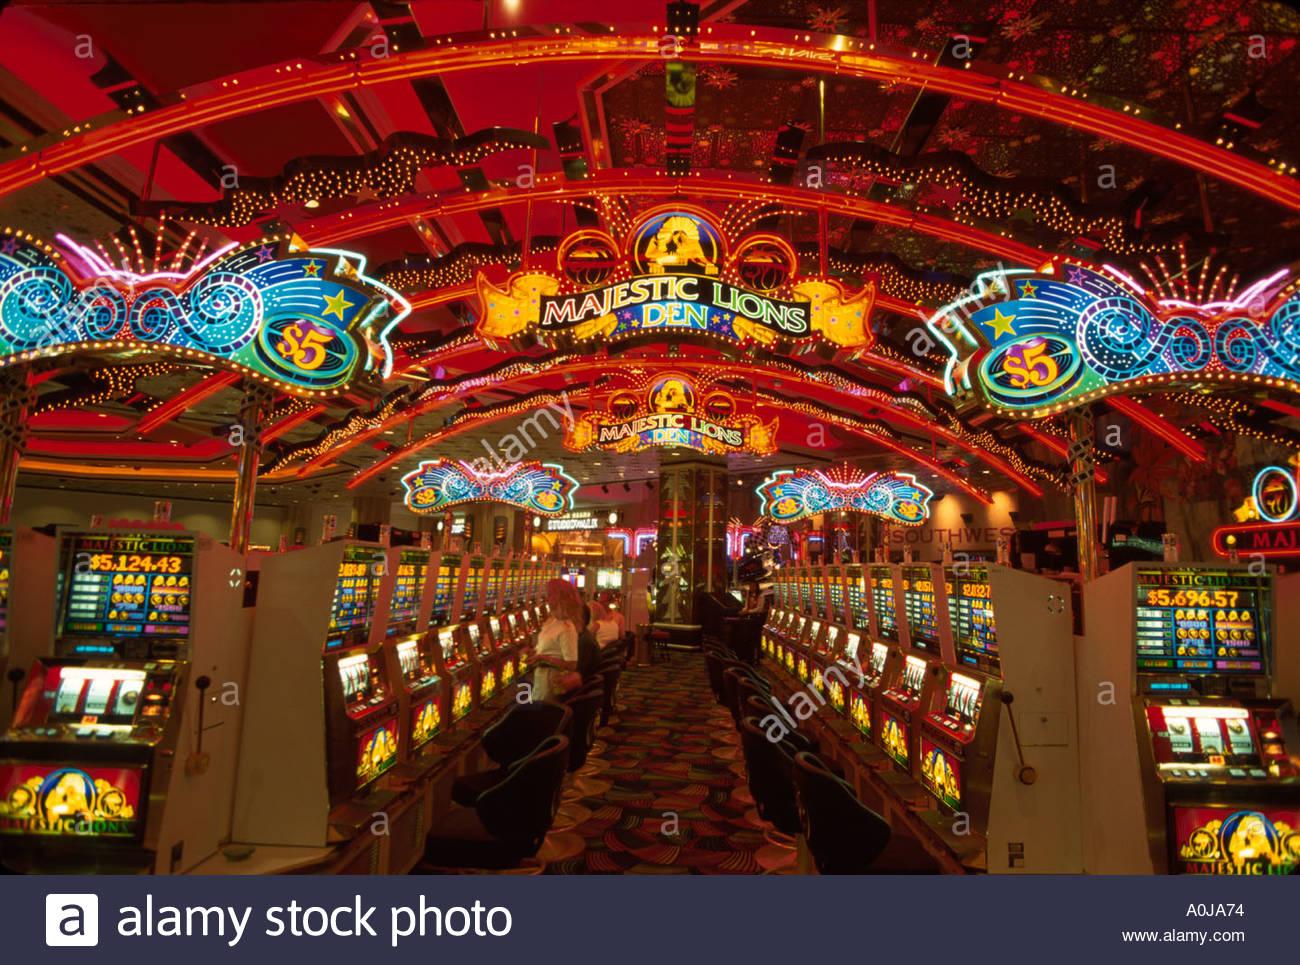 MGM Grand Hotel Casino, Las Vegas